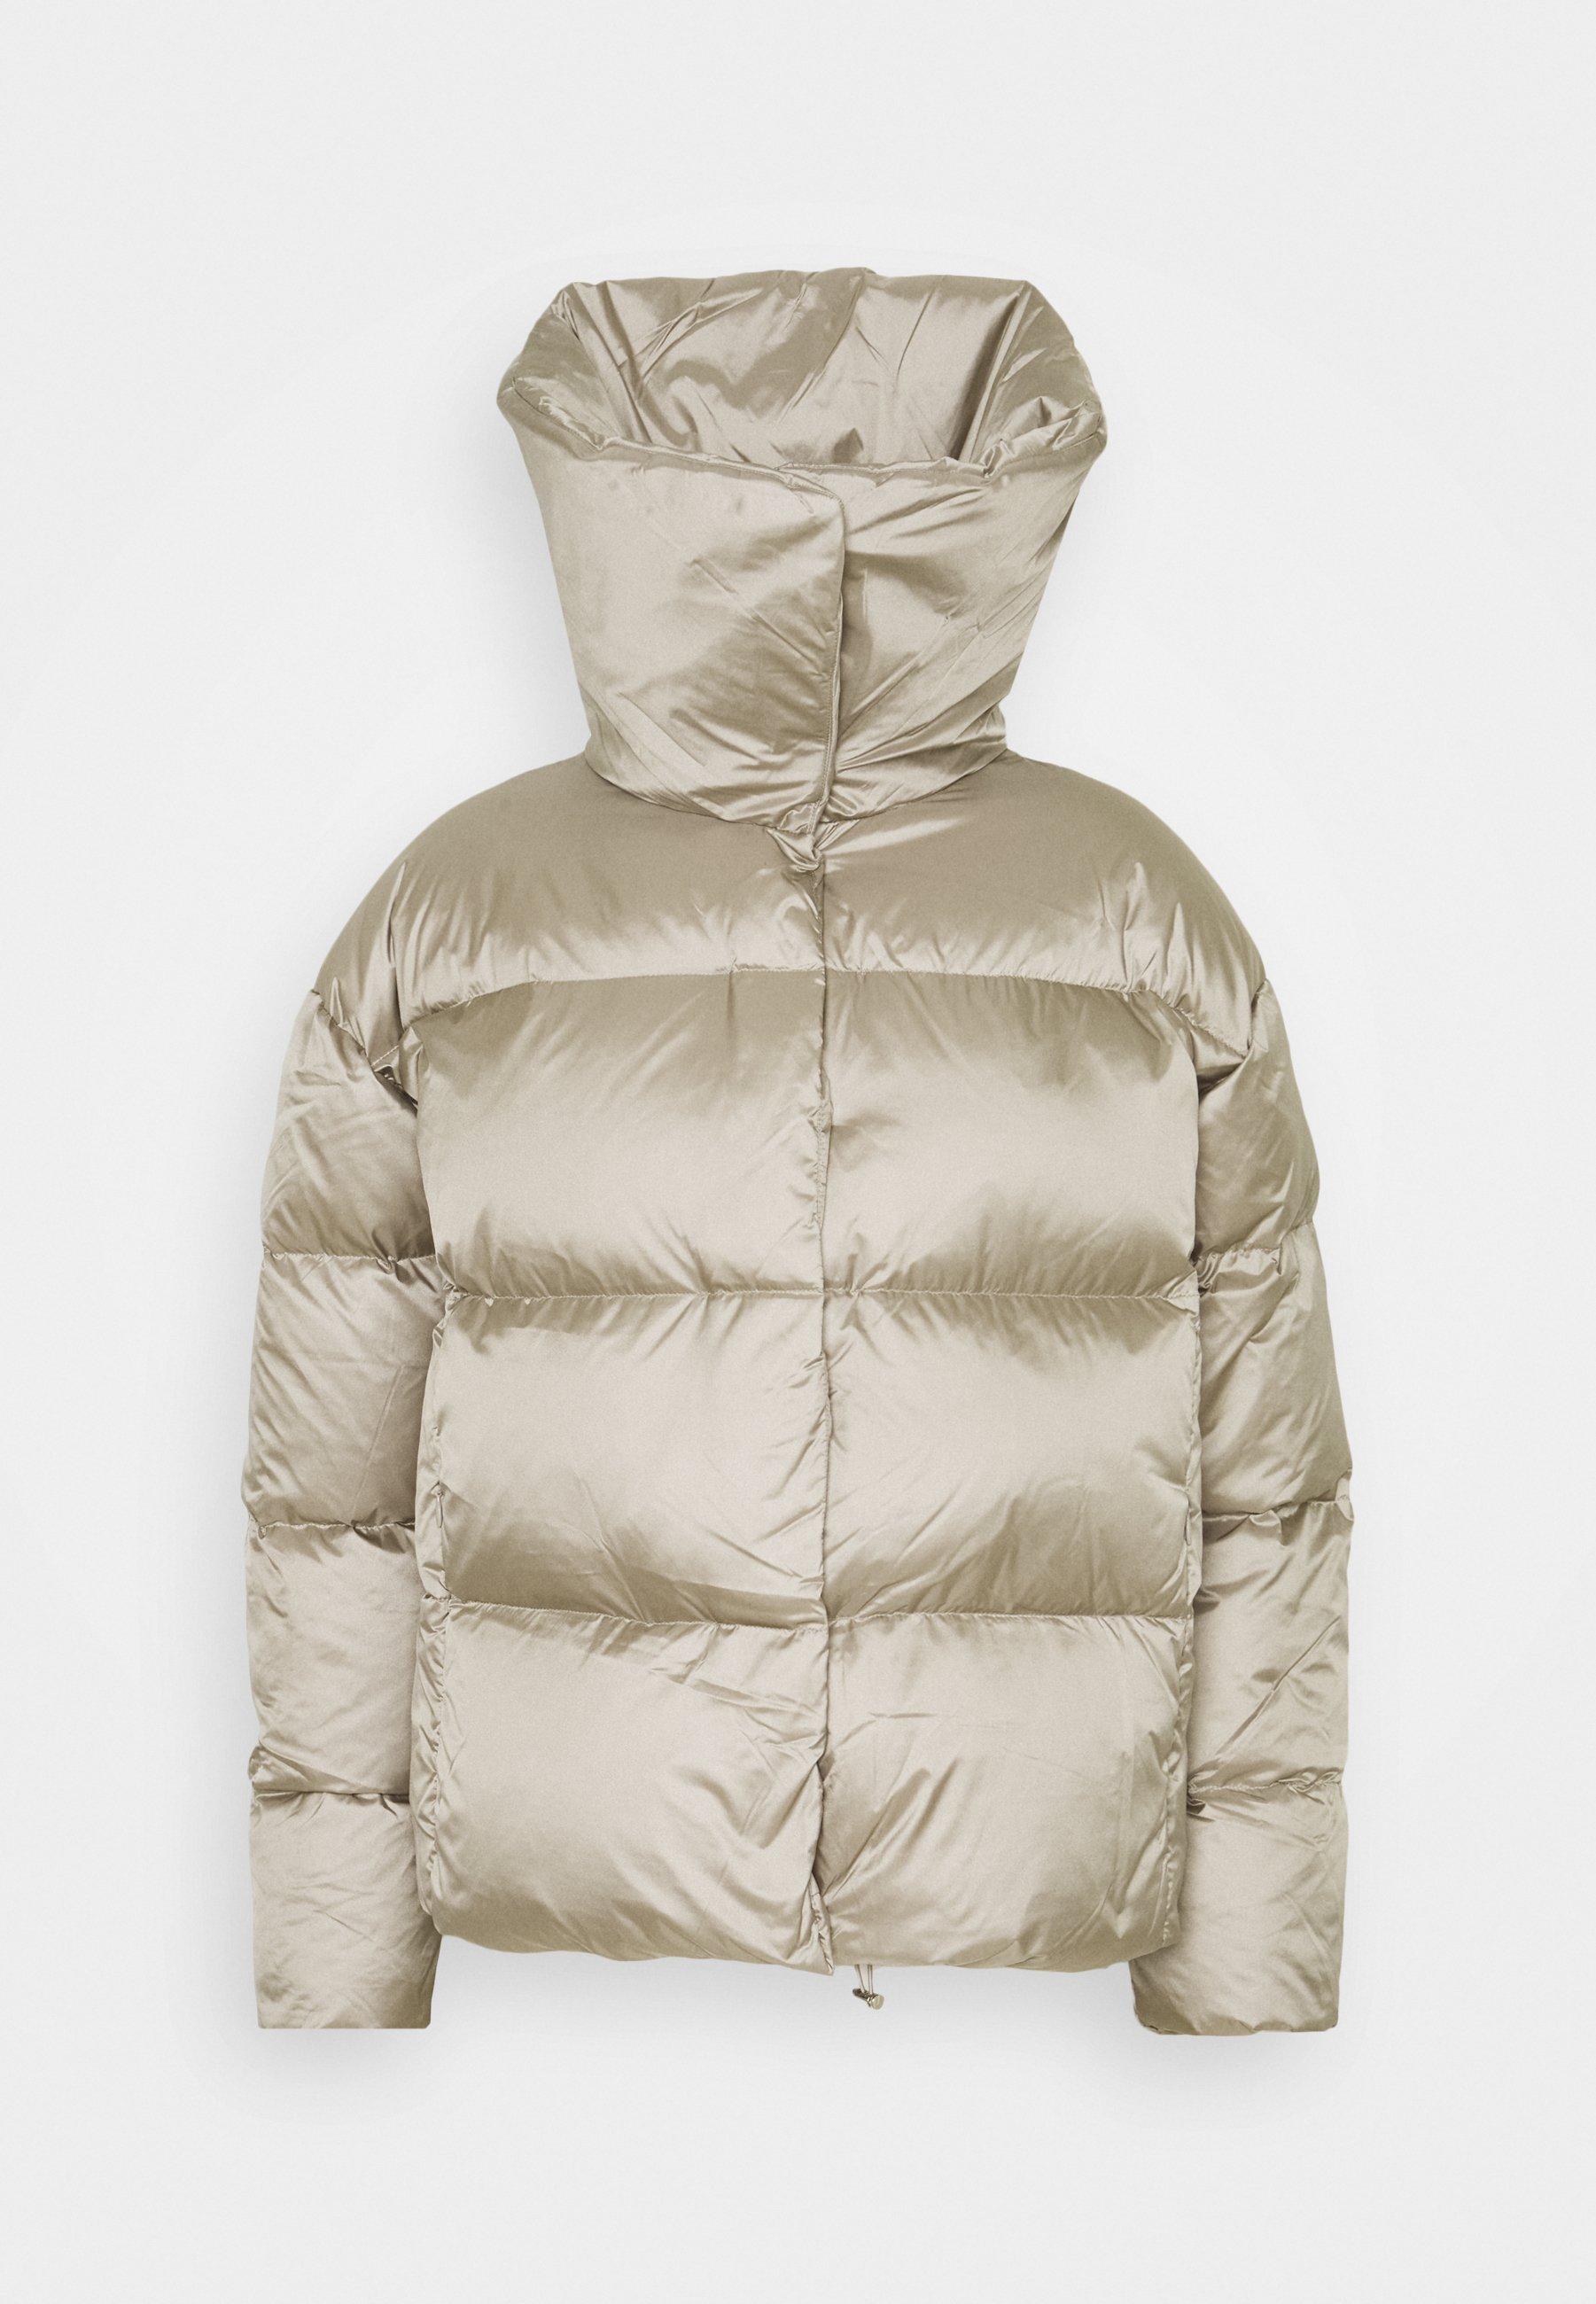 Factory Price Women's Clothing 2nd Day POWDER Down jacket laurel oak GwA8Tm0Ac